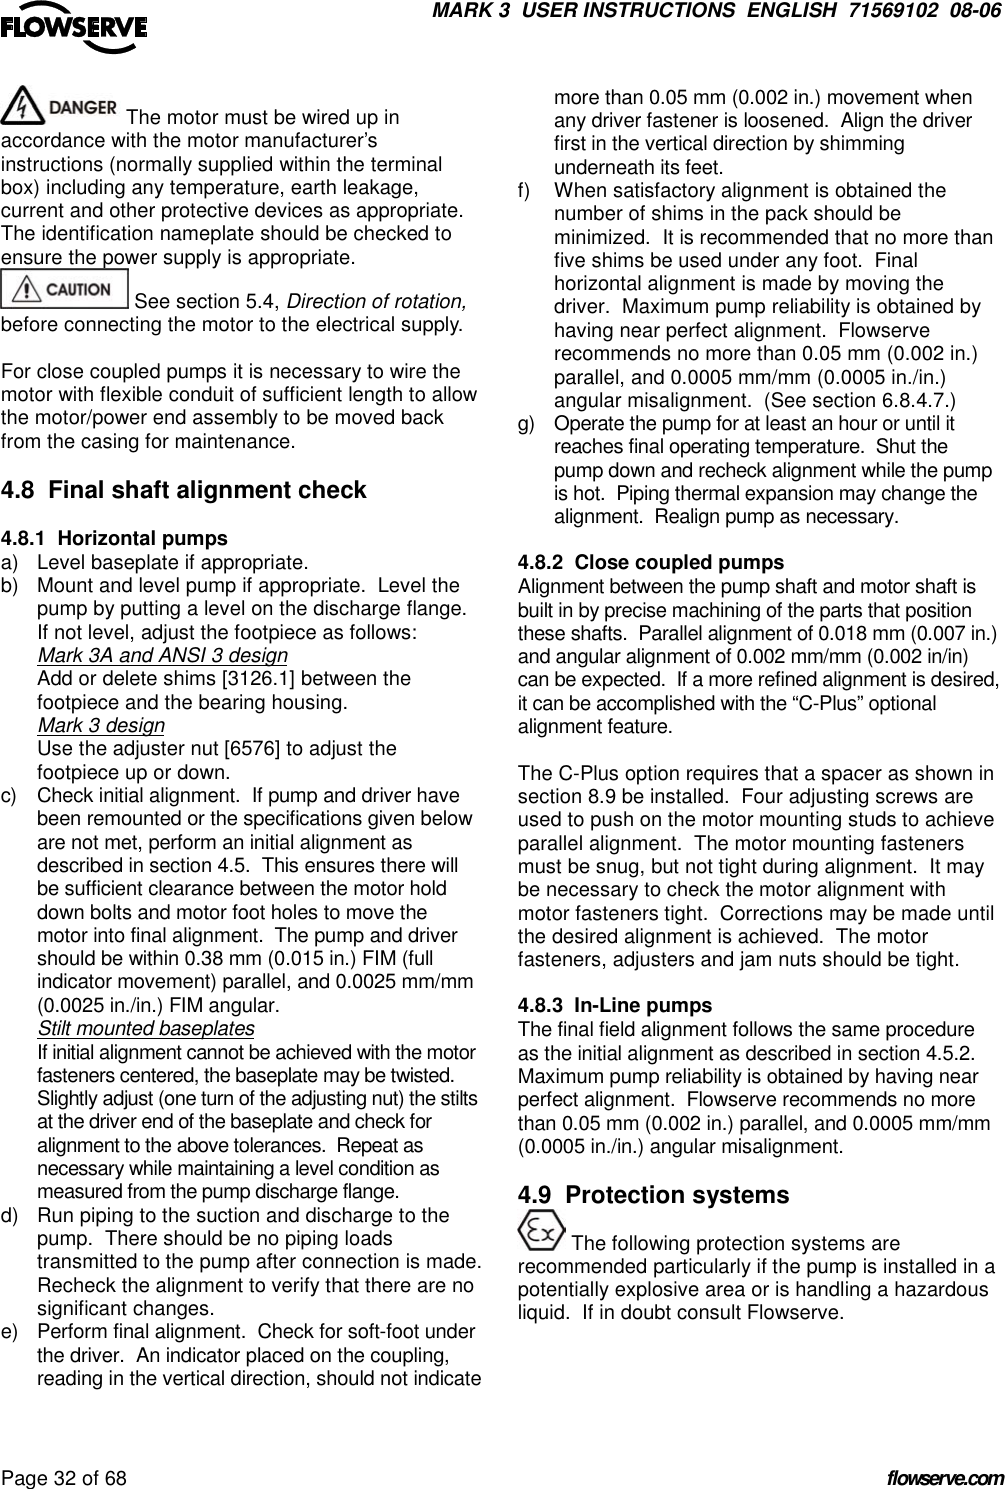 Unirex Pump Users Manual